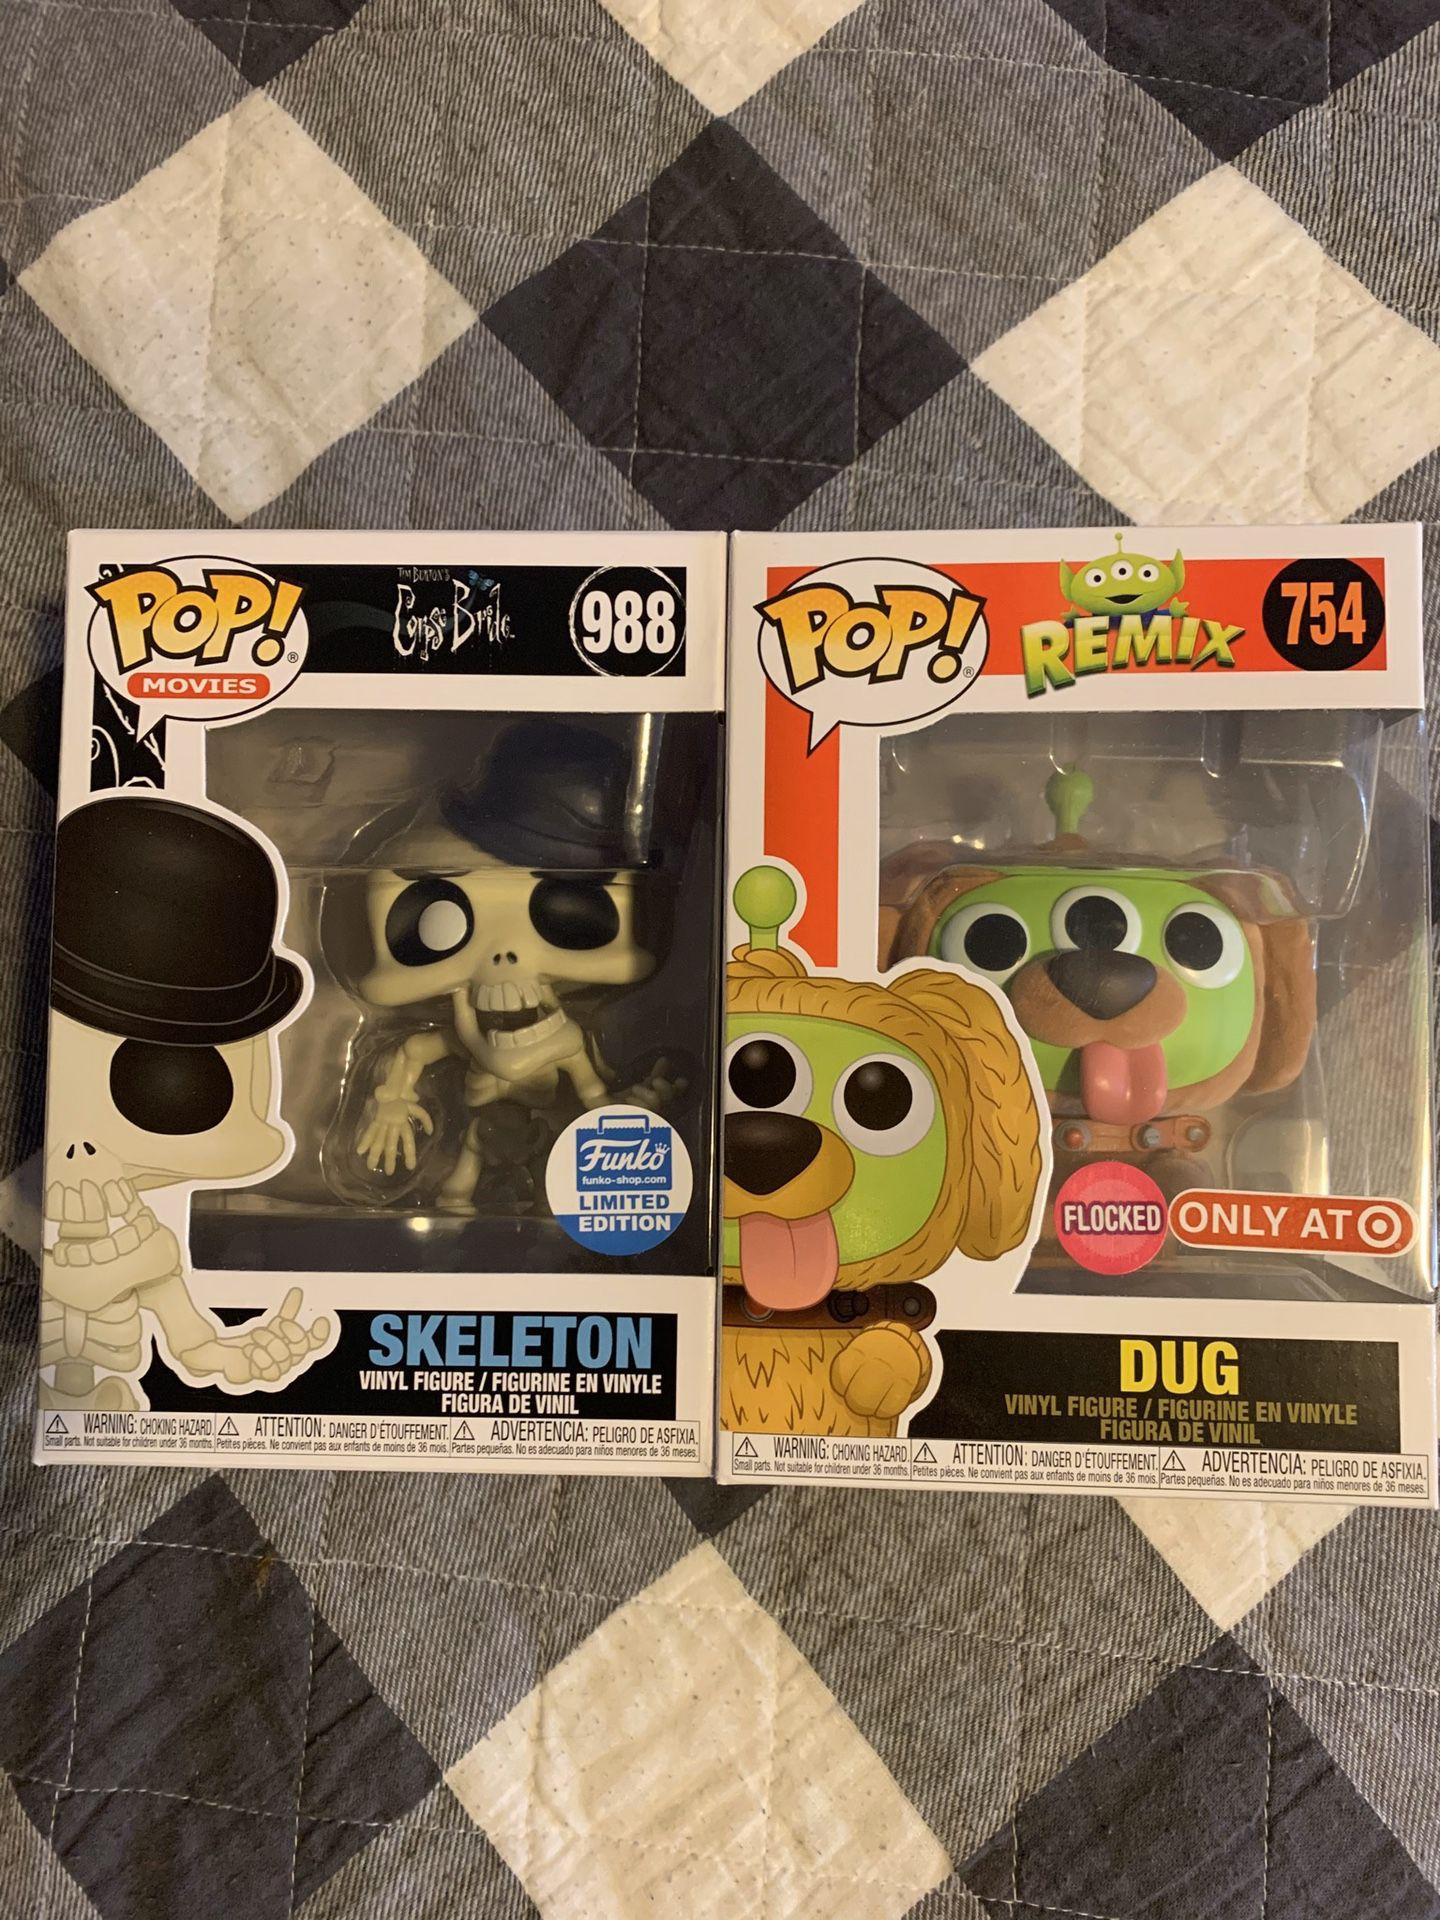 Skeleton and Dug funko pop